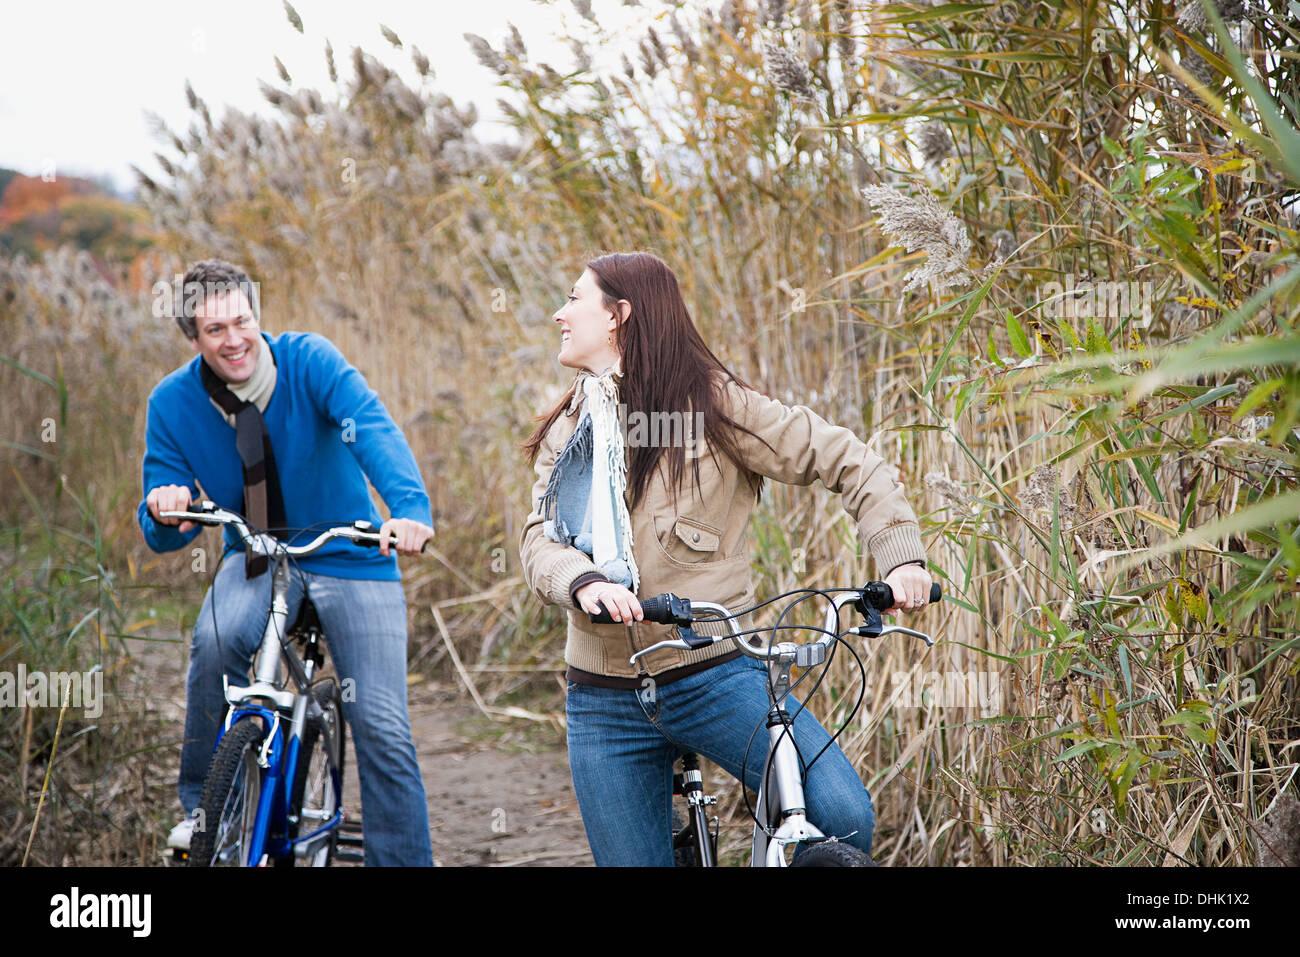 A couple cycling - Stock Image